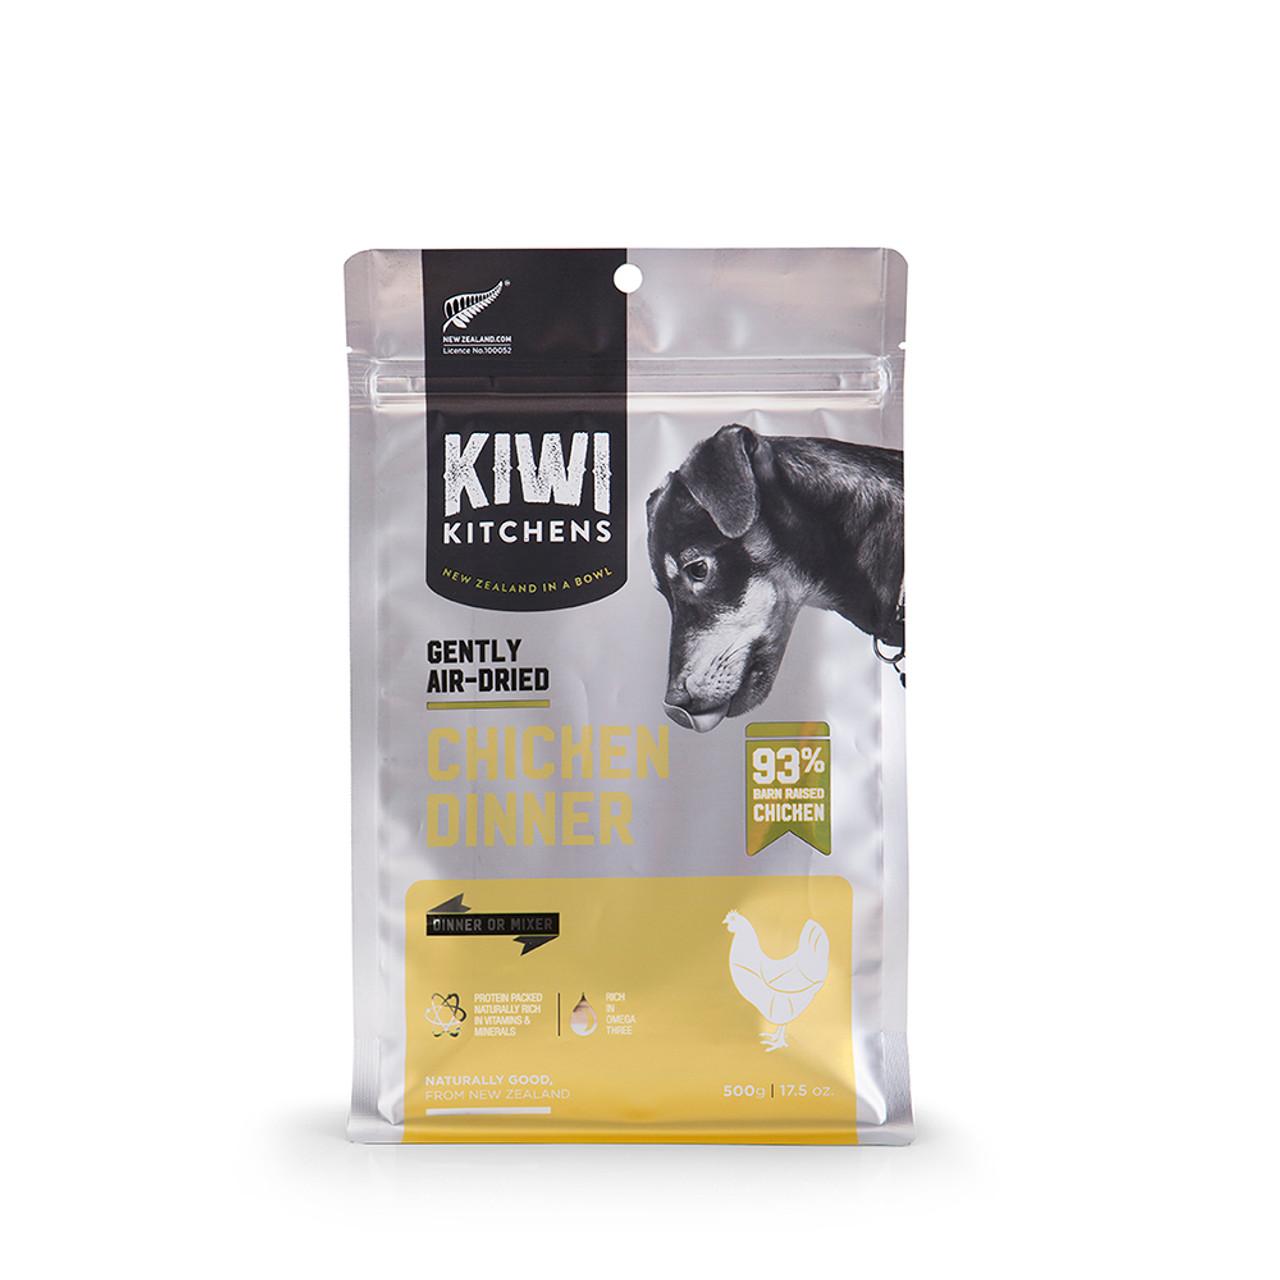 Kiwi Kitchens Gently Air-Dried Chicken Dinner Dog Food